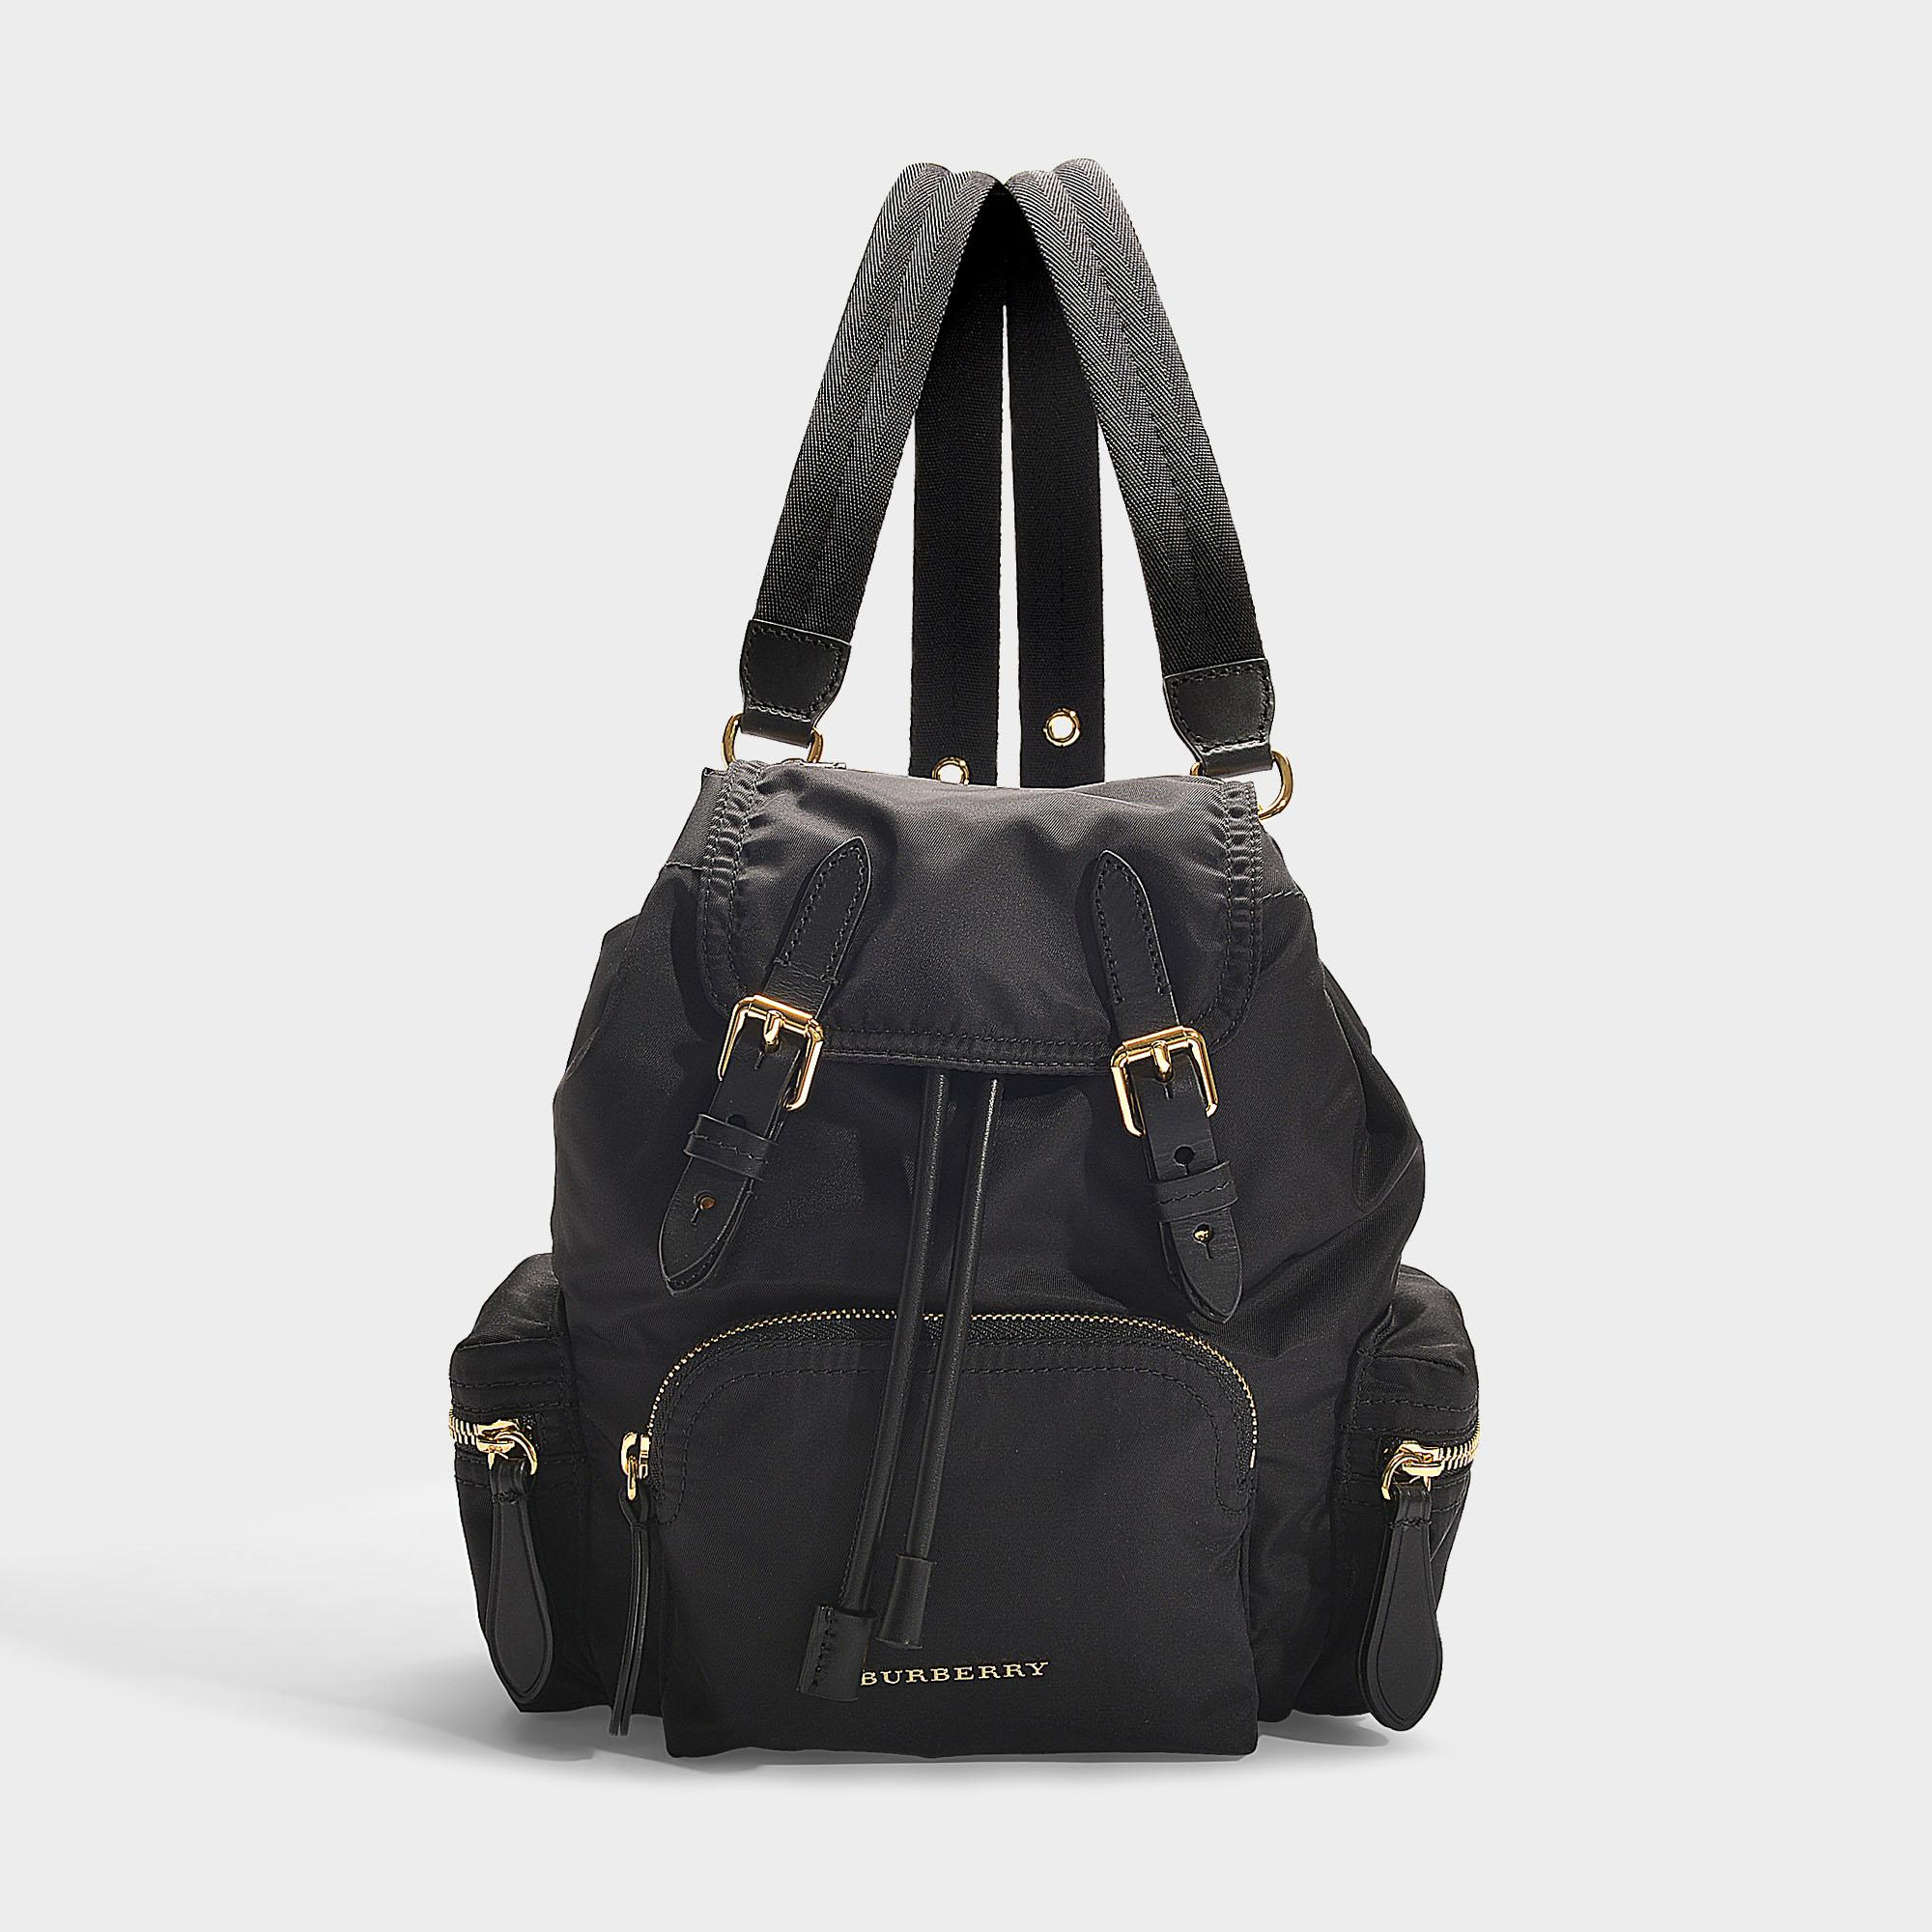 Burberry - The Rucksack Small Backpack In Black Nylon - Lyst. View  fullscreen 372a57973cb94